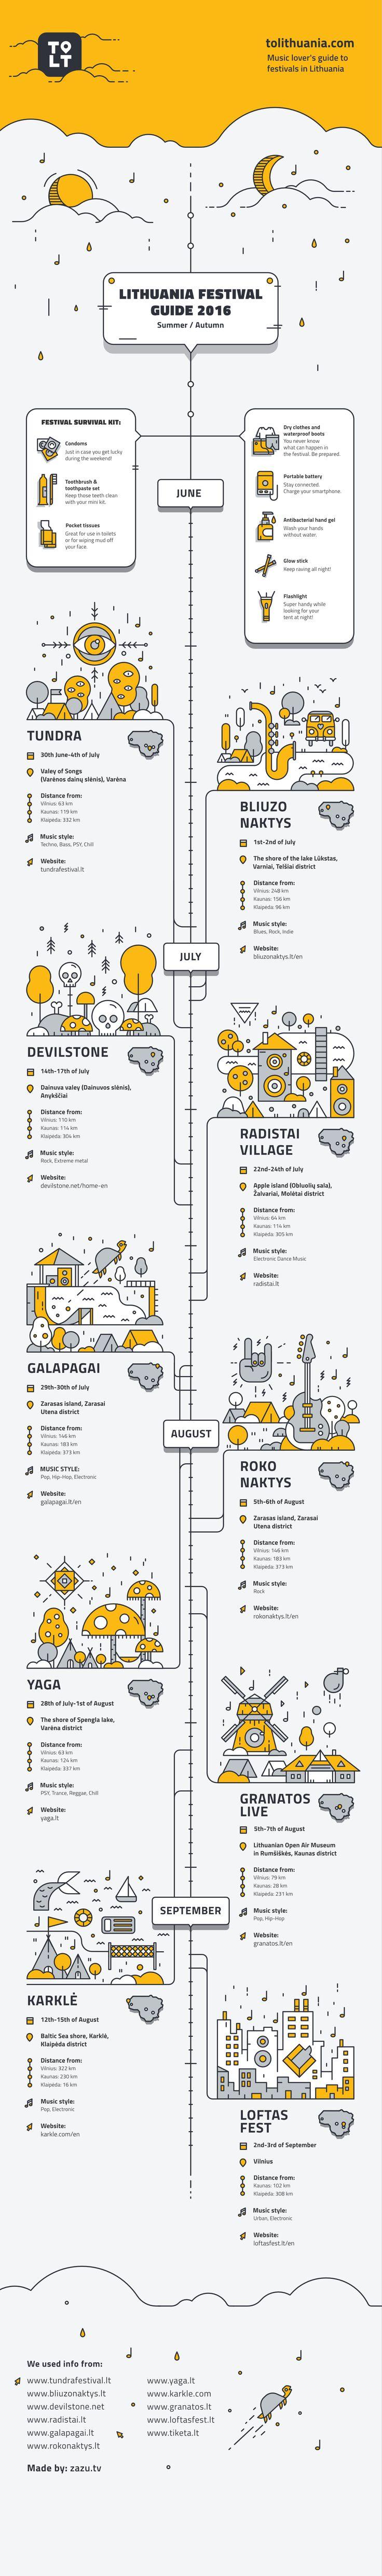 Lithuania Festival Guide 2016 – Go To Lithuania